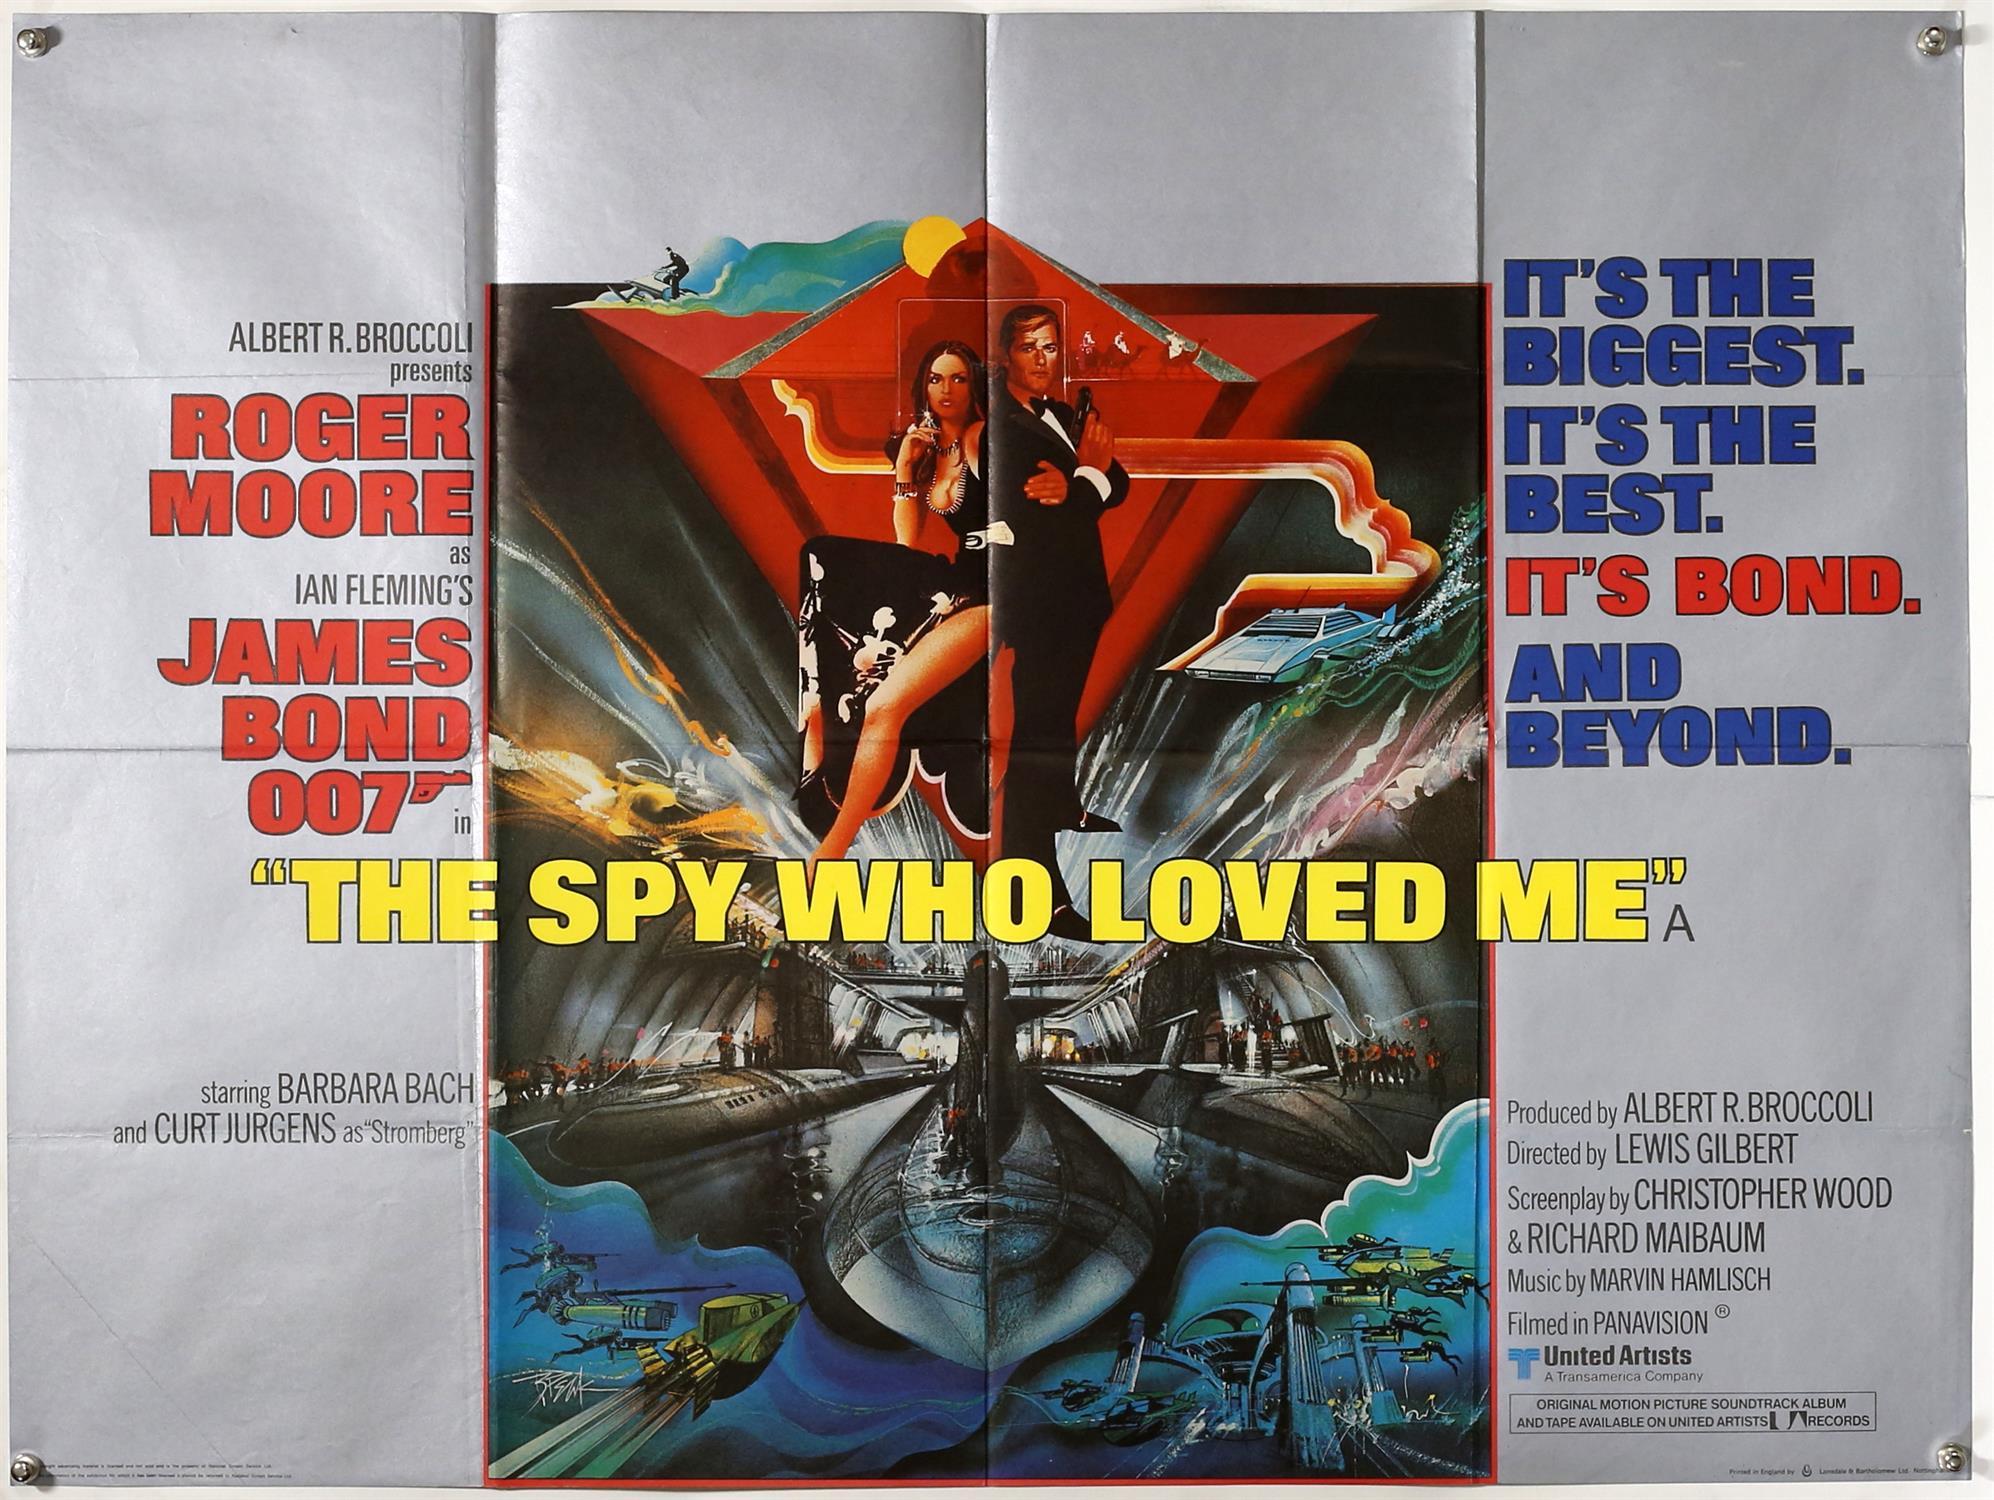 James Bond The Spy Who Loved Me (1977) British Quad film poster, artwork by Bob Peak, folded,